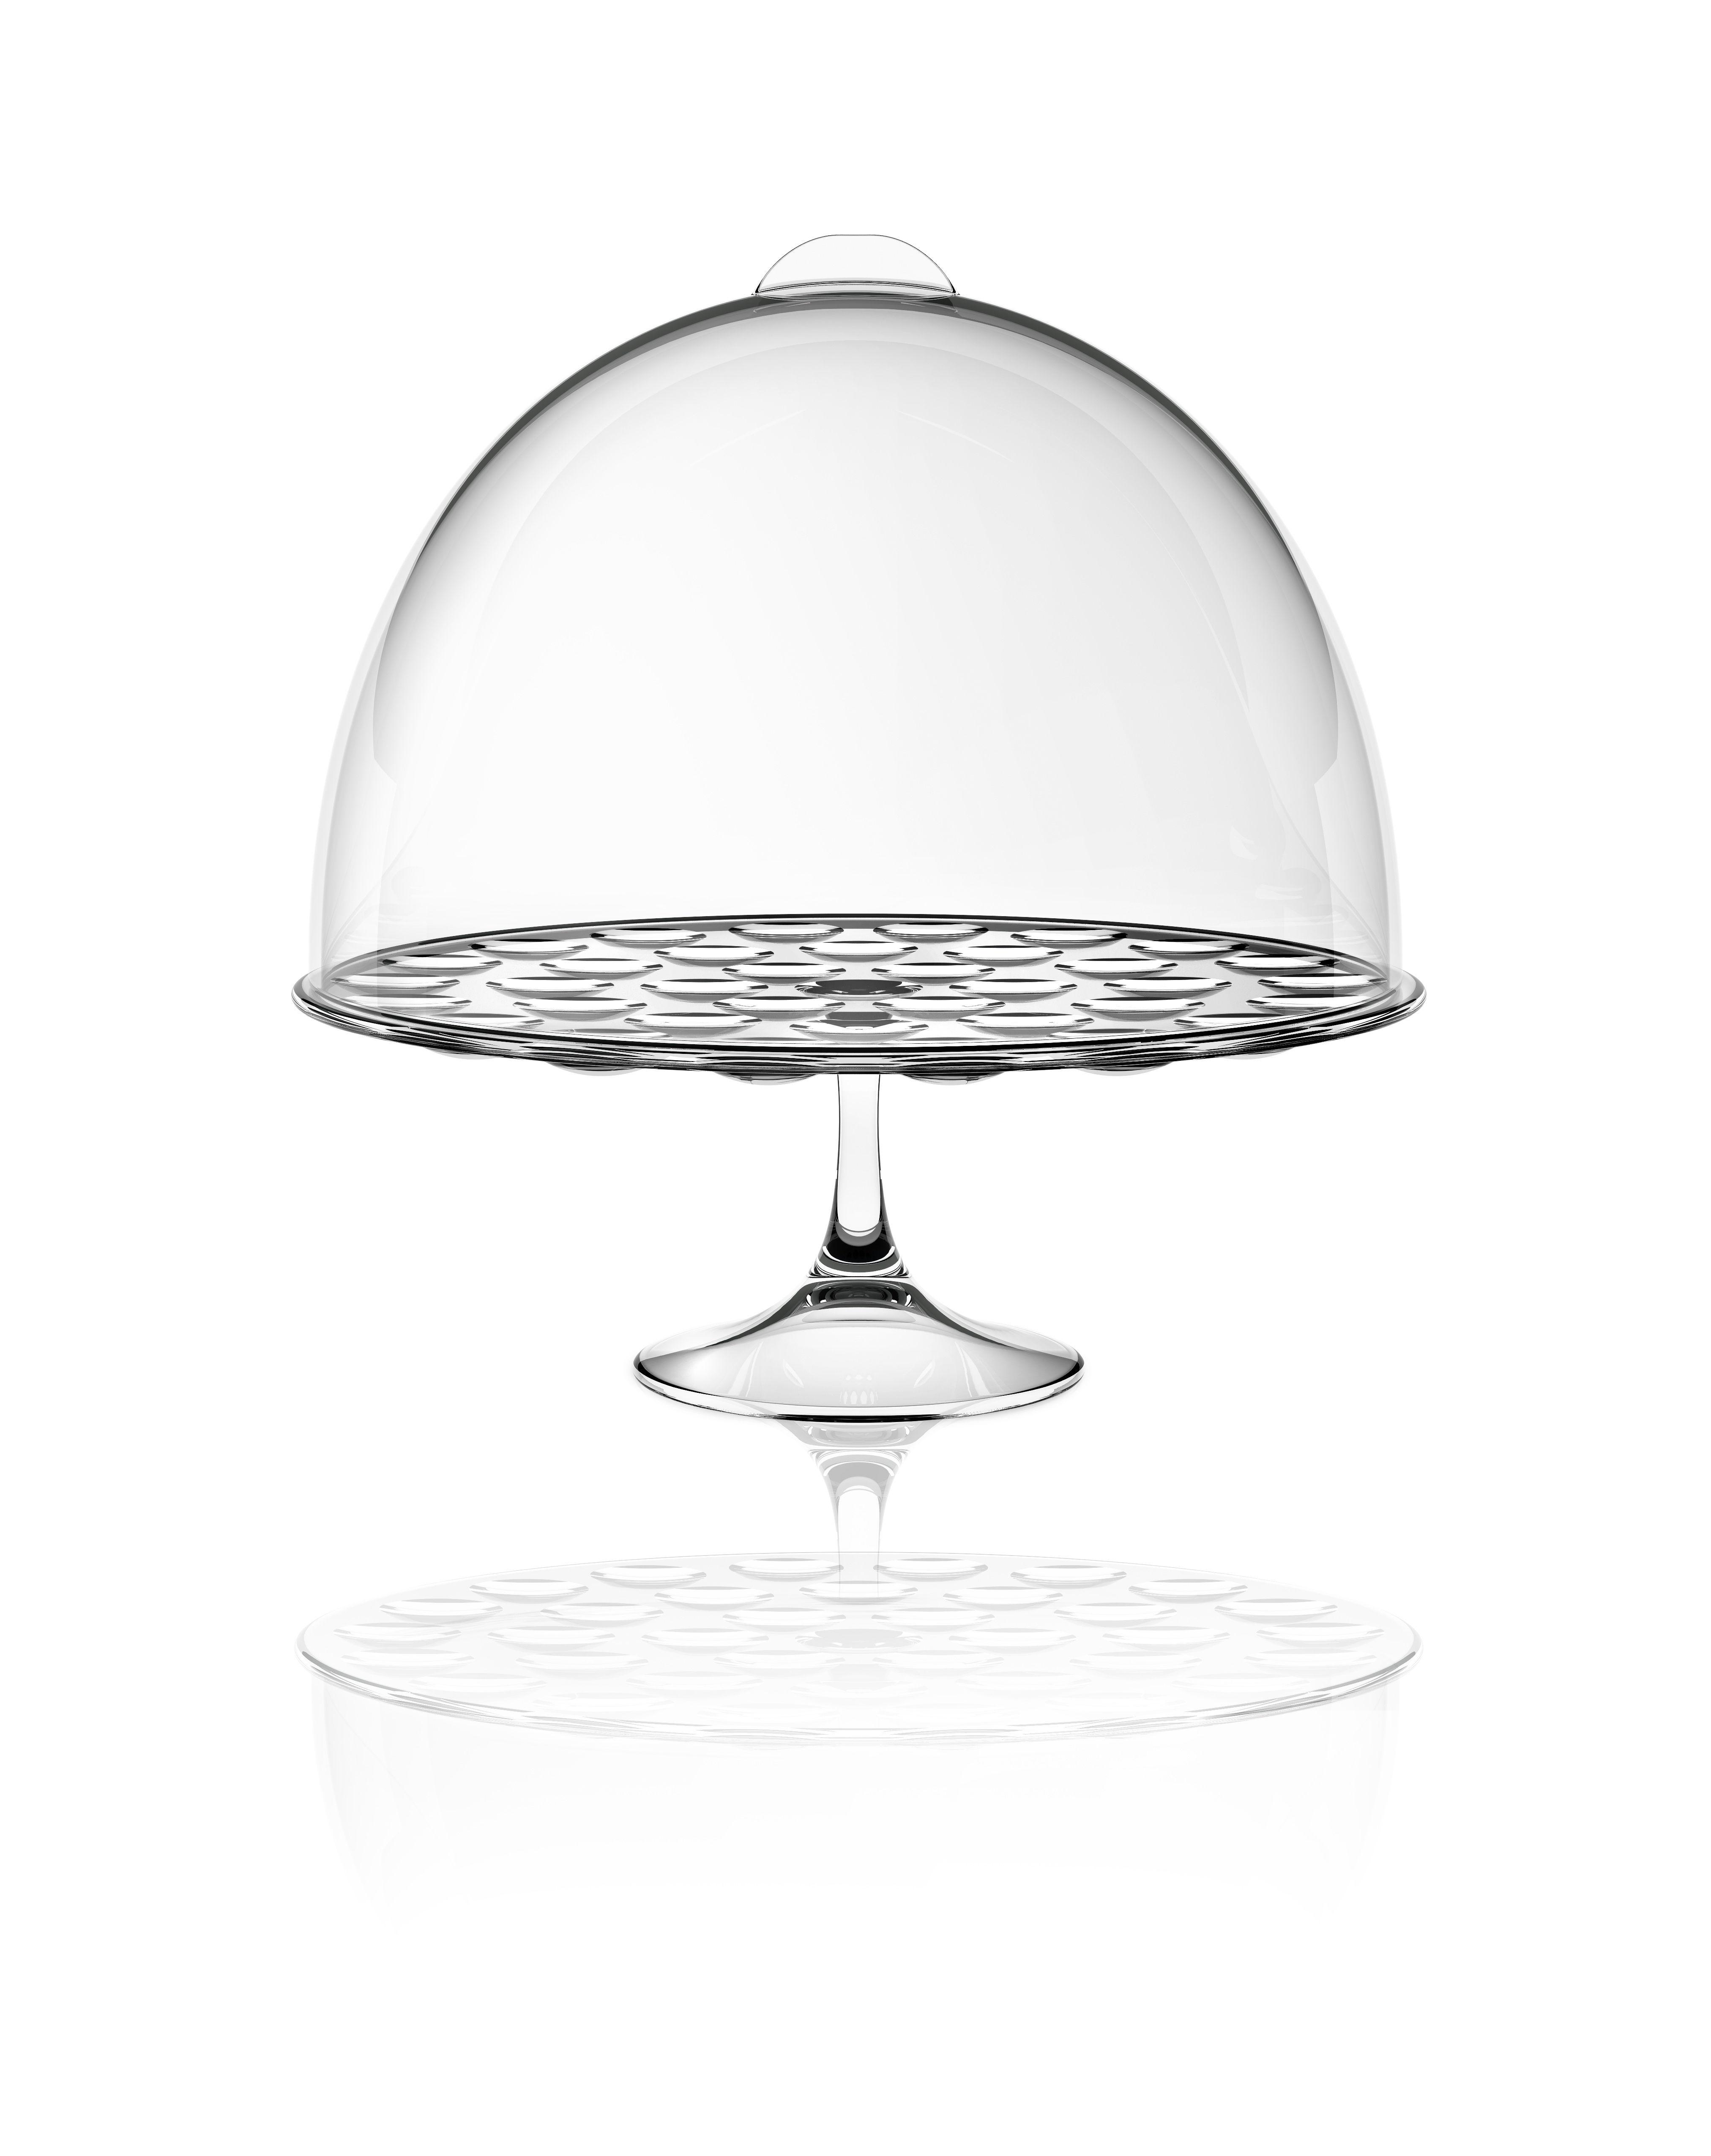 cloche pour plateau g teau bolle transparent italesse. Black Bedroom Furniture Sets. Home Design Ideas